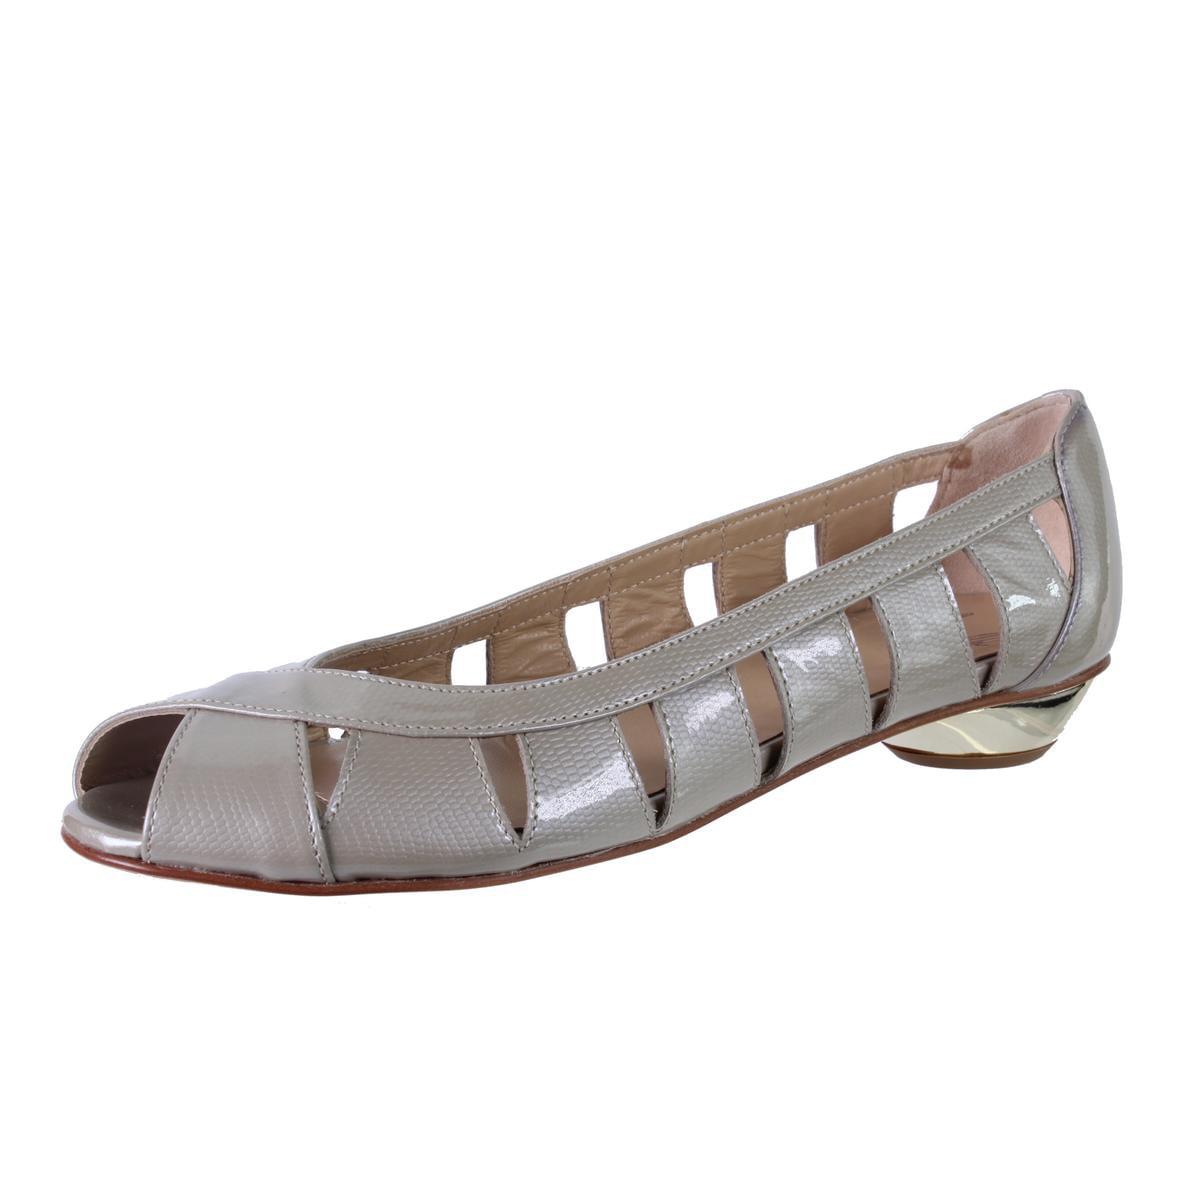 Amalfi by Rangoni Womens Idelle Lizard Metallic Peep-Toe Shoes by Amalfi by Rangoni